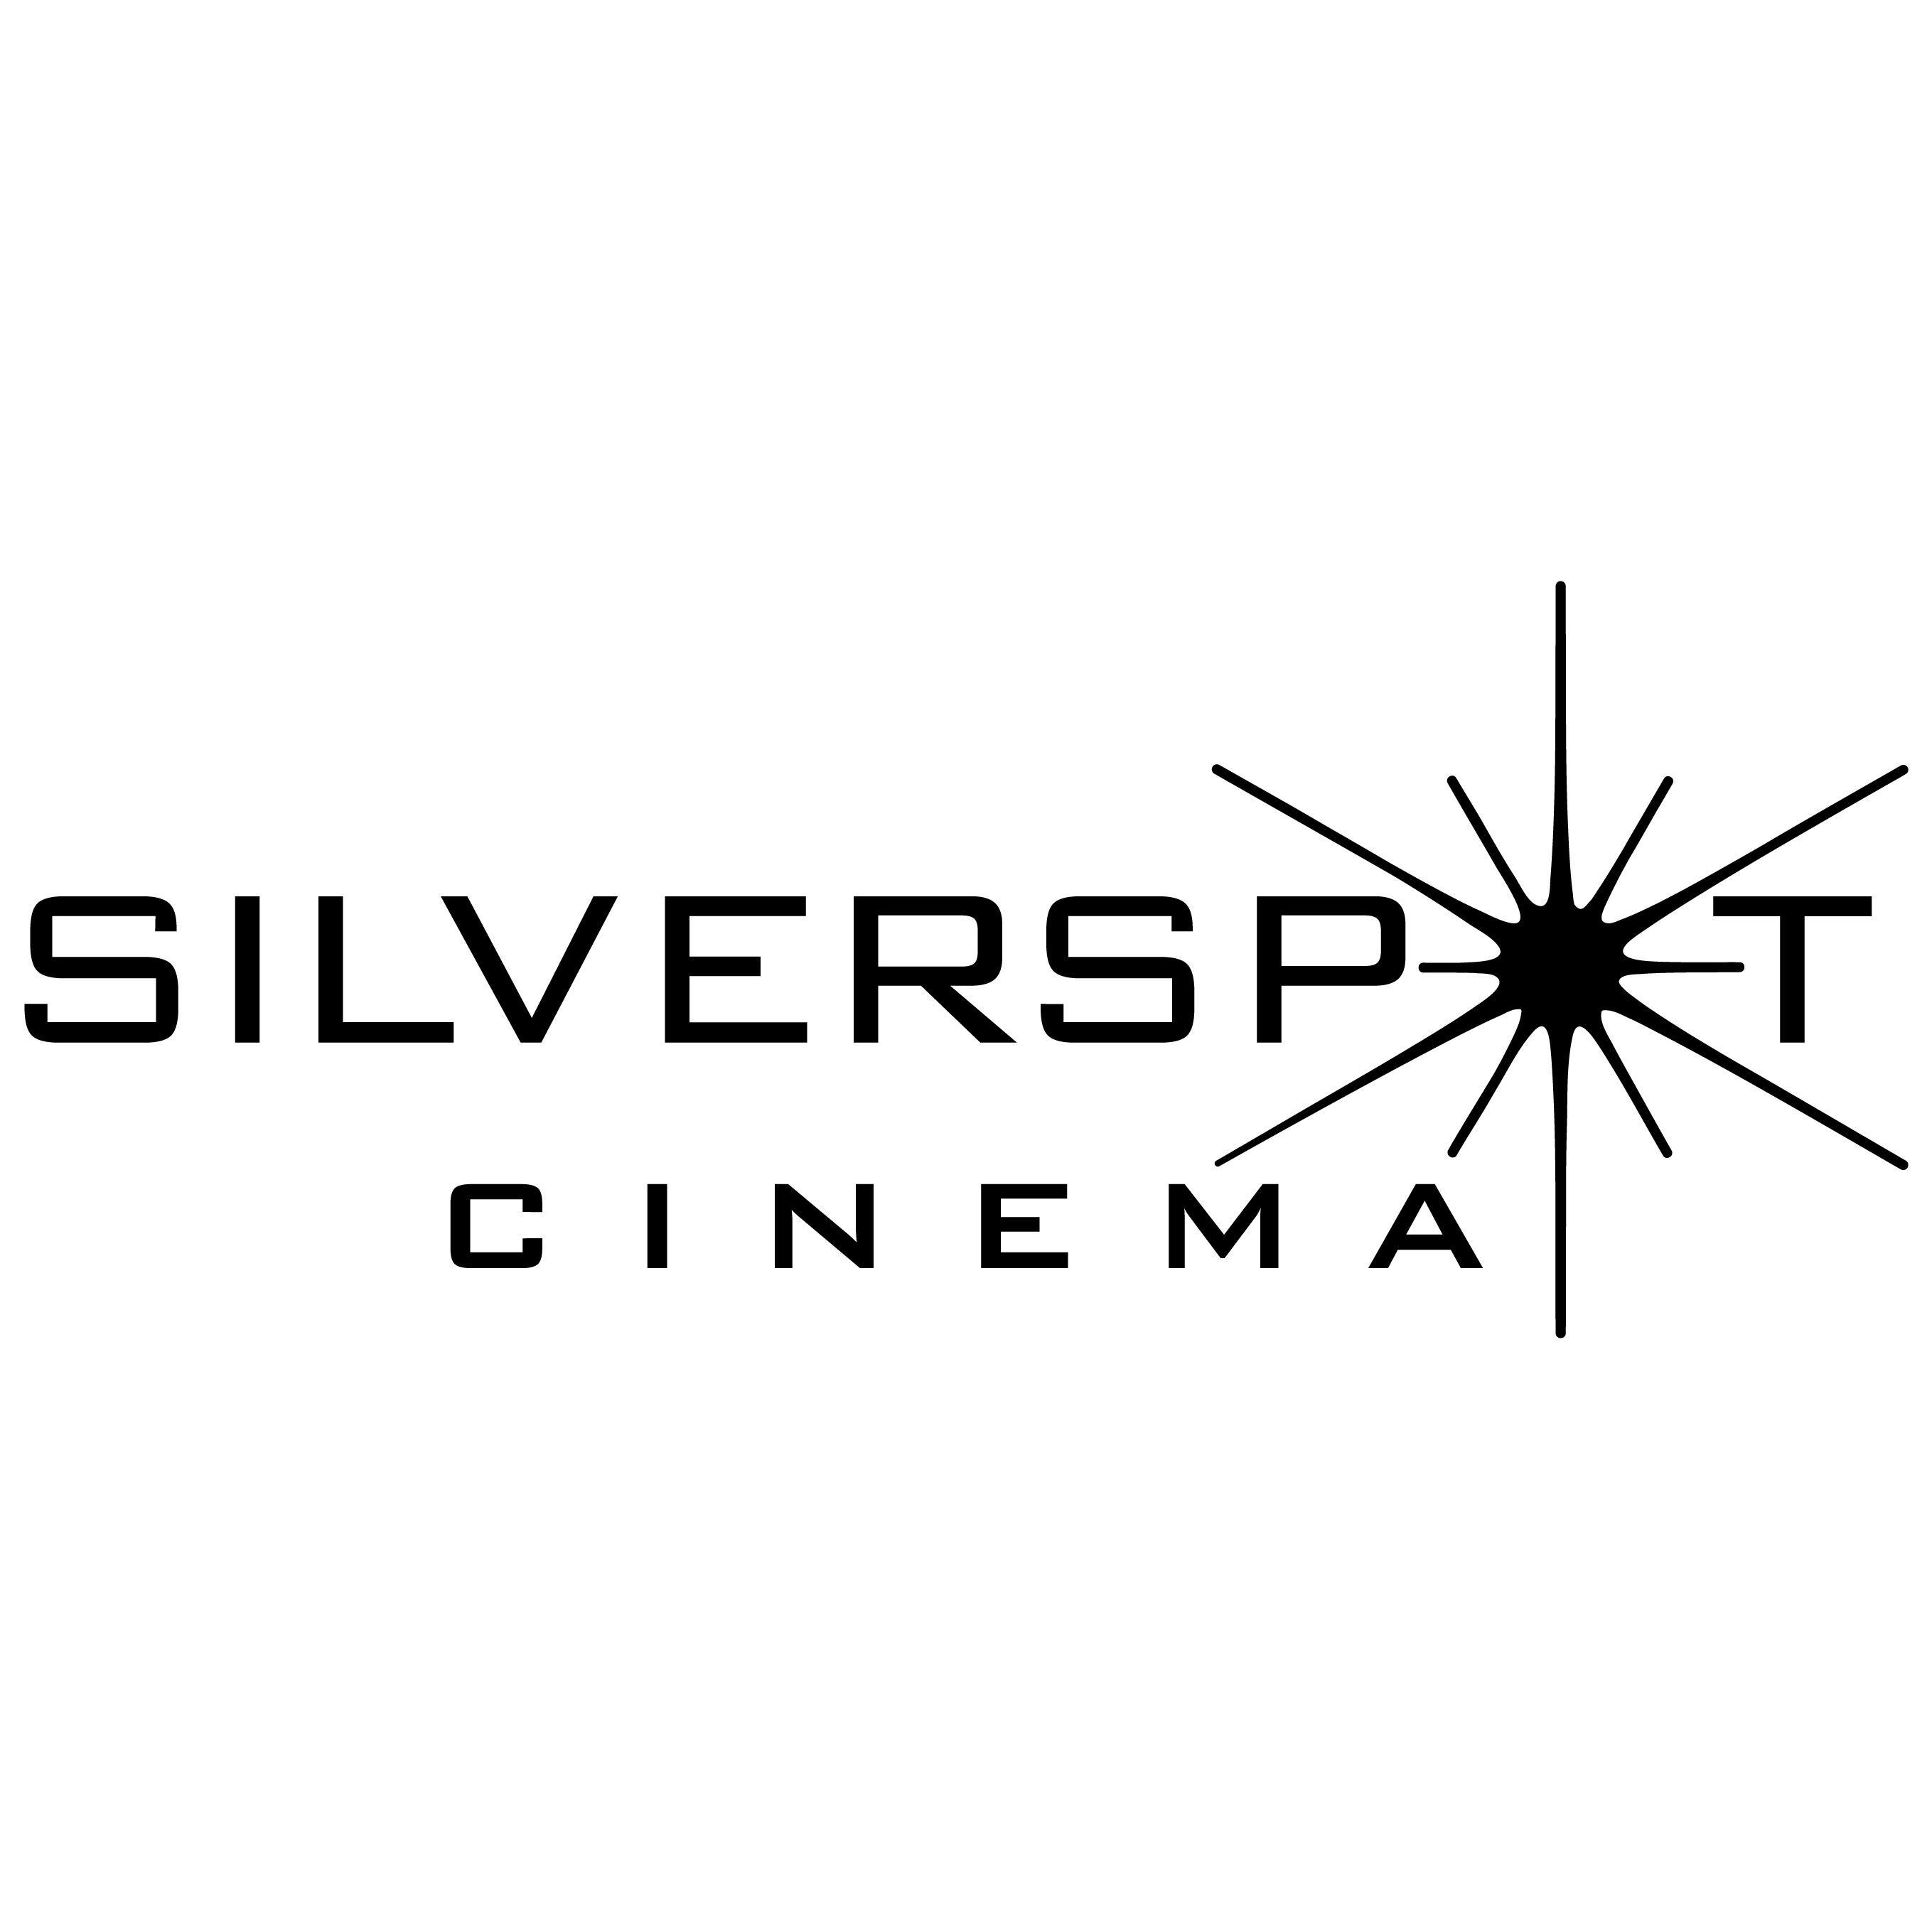 Silverspot Cinema - The Corners of Brookfield